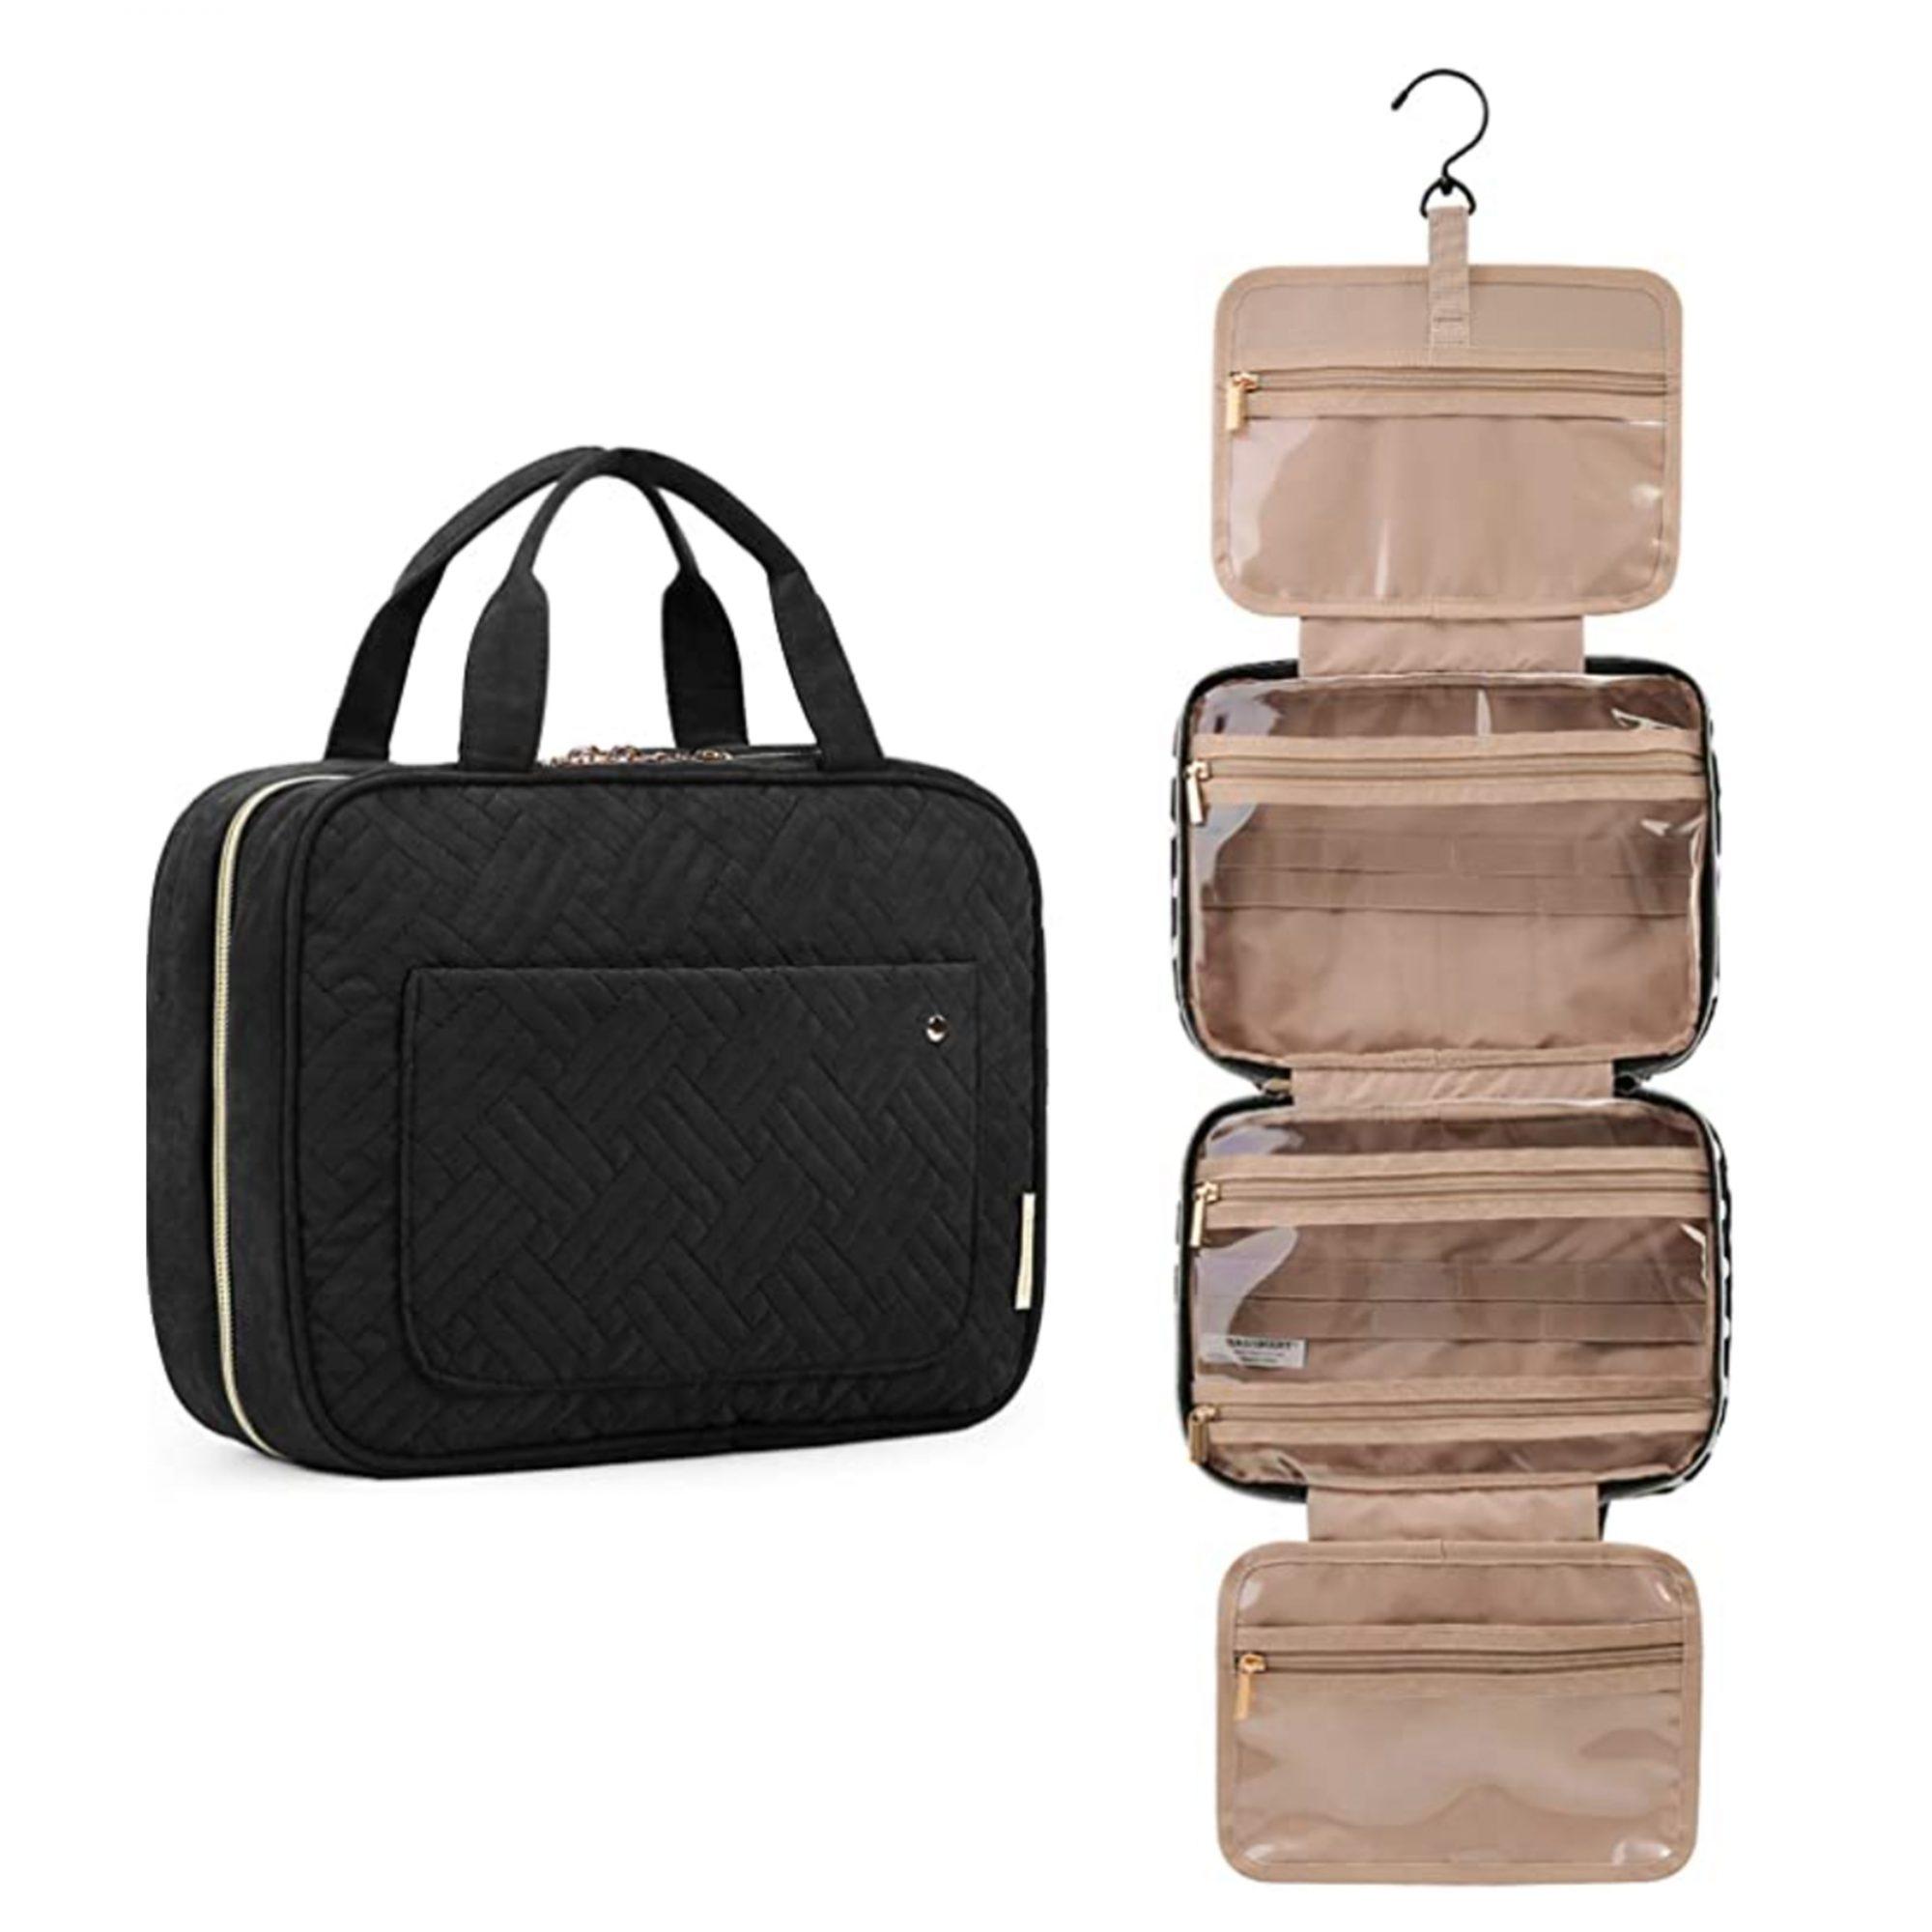 amazon-toiletry-bag, best-travel-bags